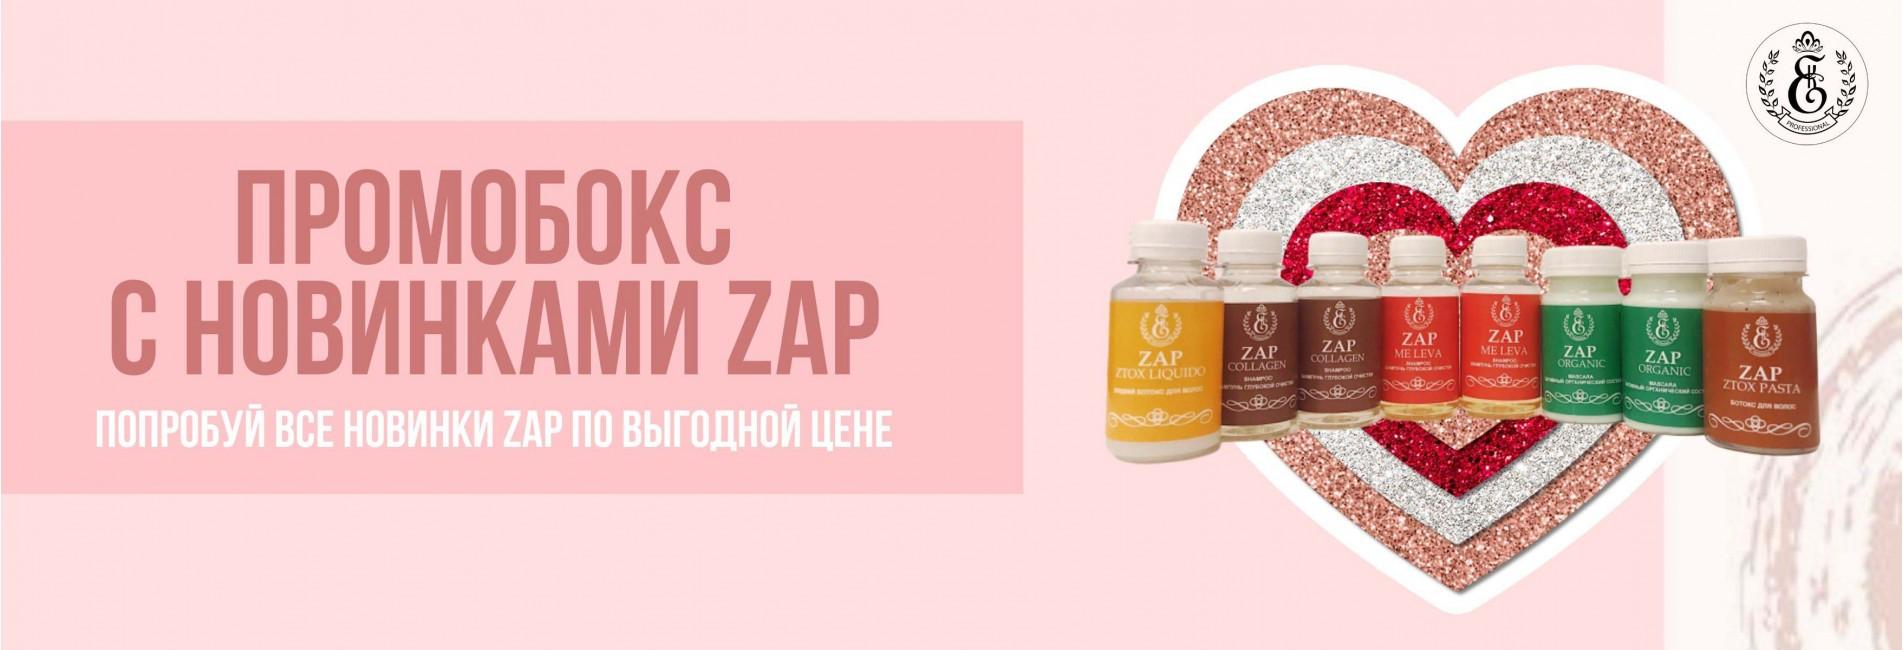 Промобокс ZAP